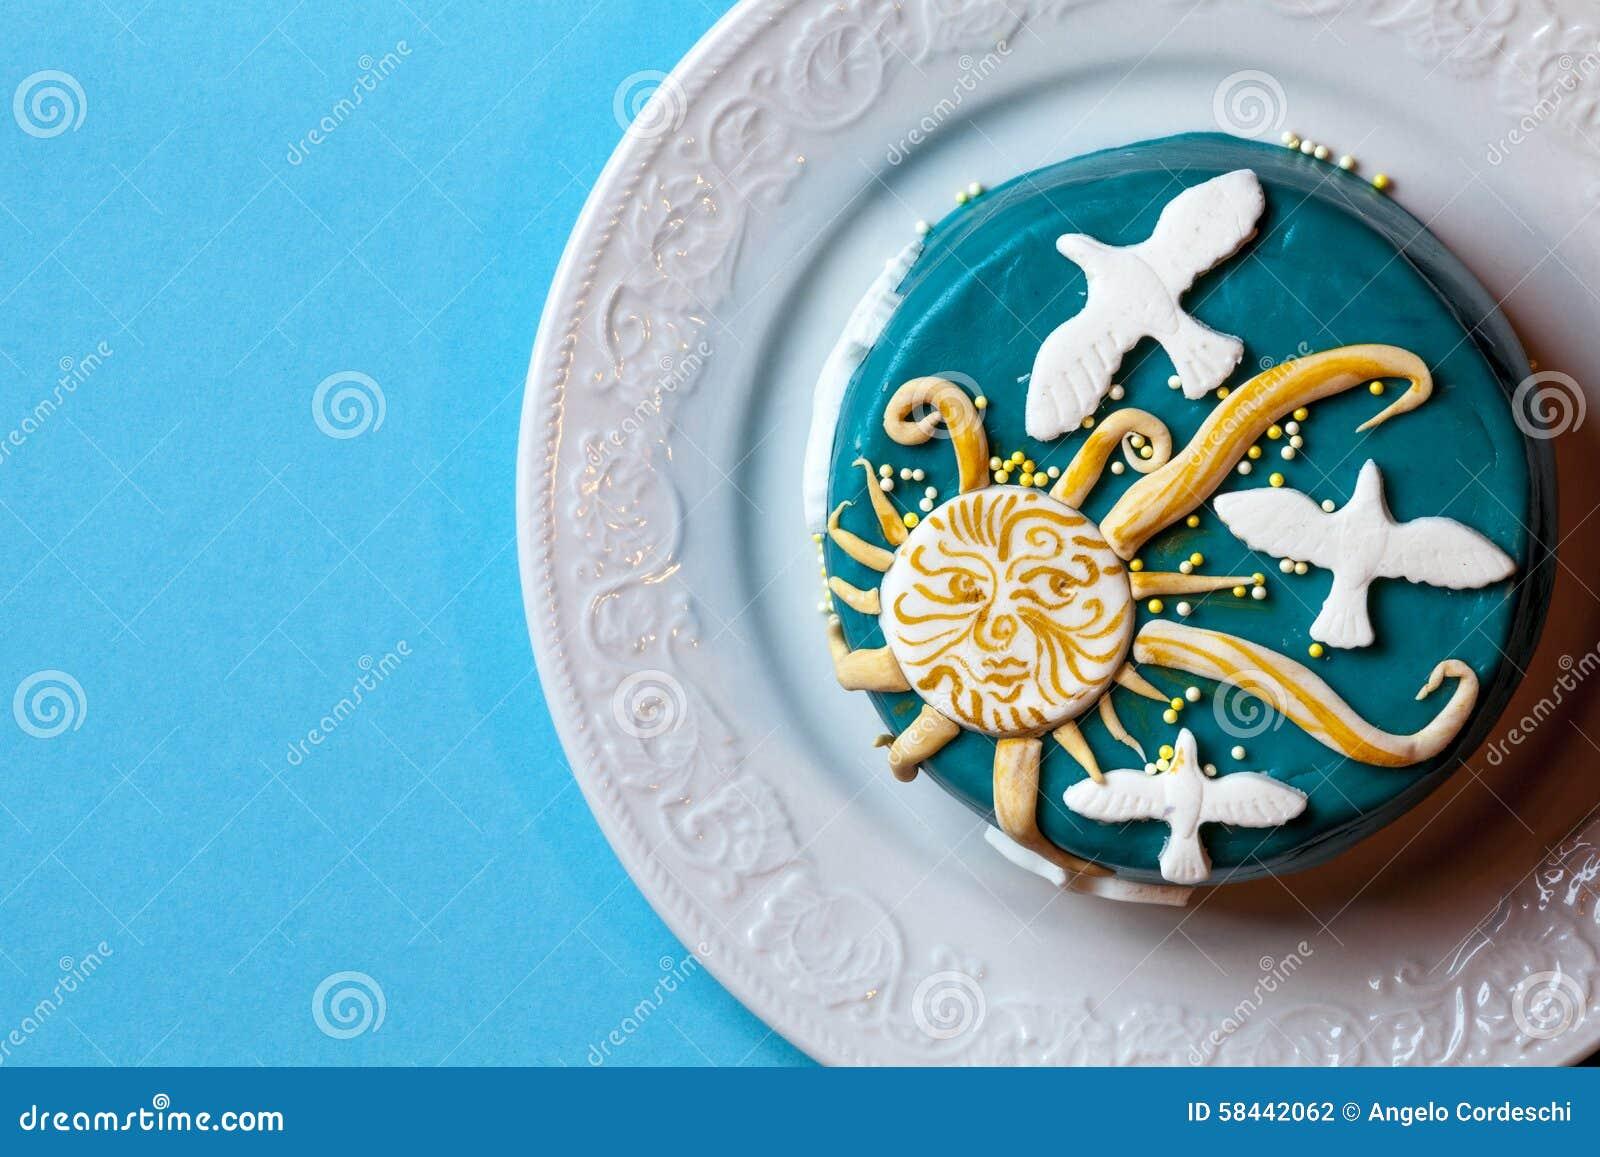 Gelbes Kuchendesign Logos Dekoration - conanpartners -